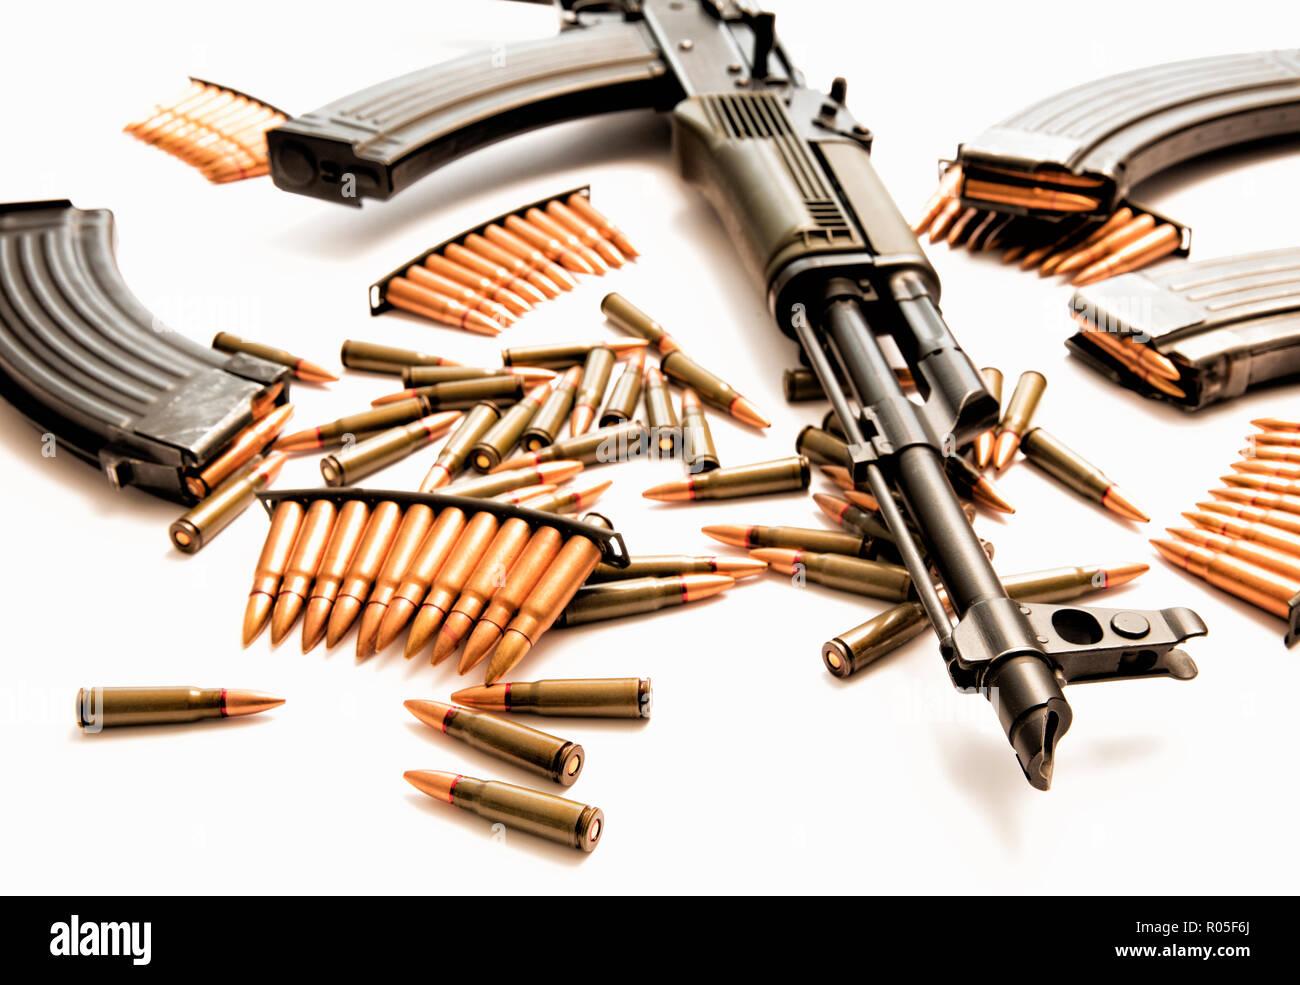 AK-47 assault rifle with live ammunition - Stock Image